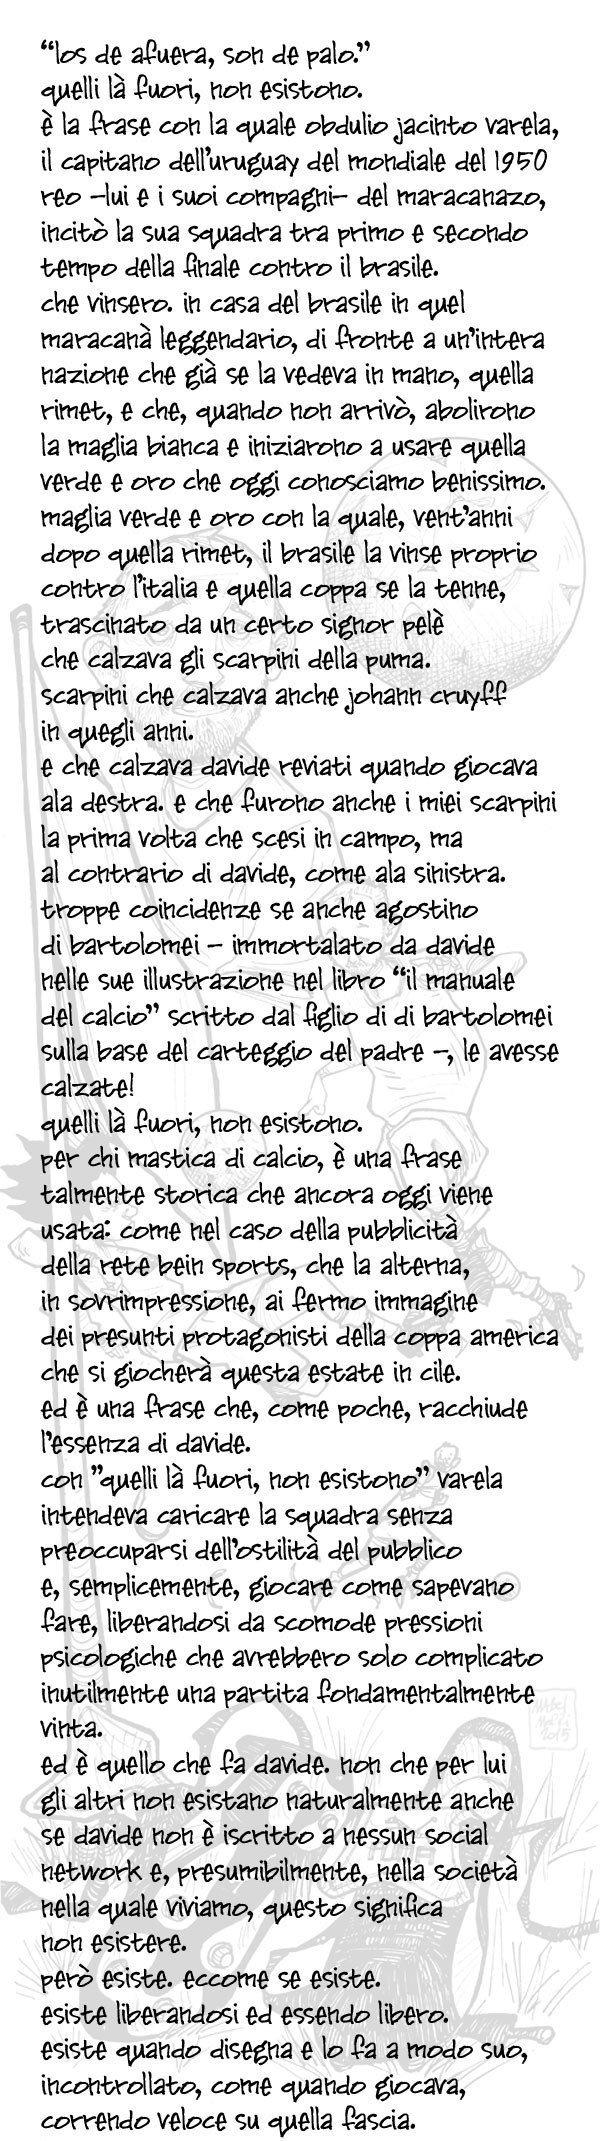 MabelMorriRacconta_DavideReviati1-600